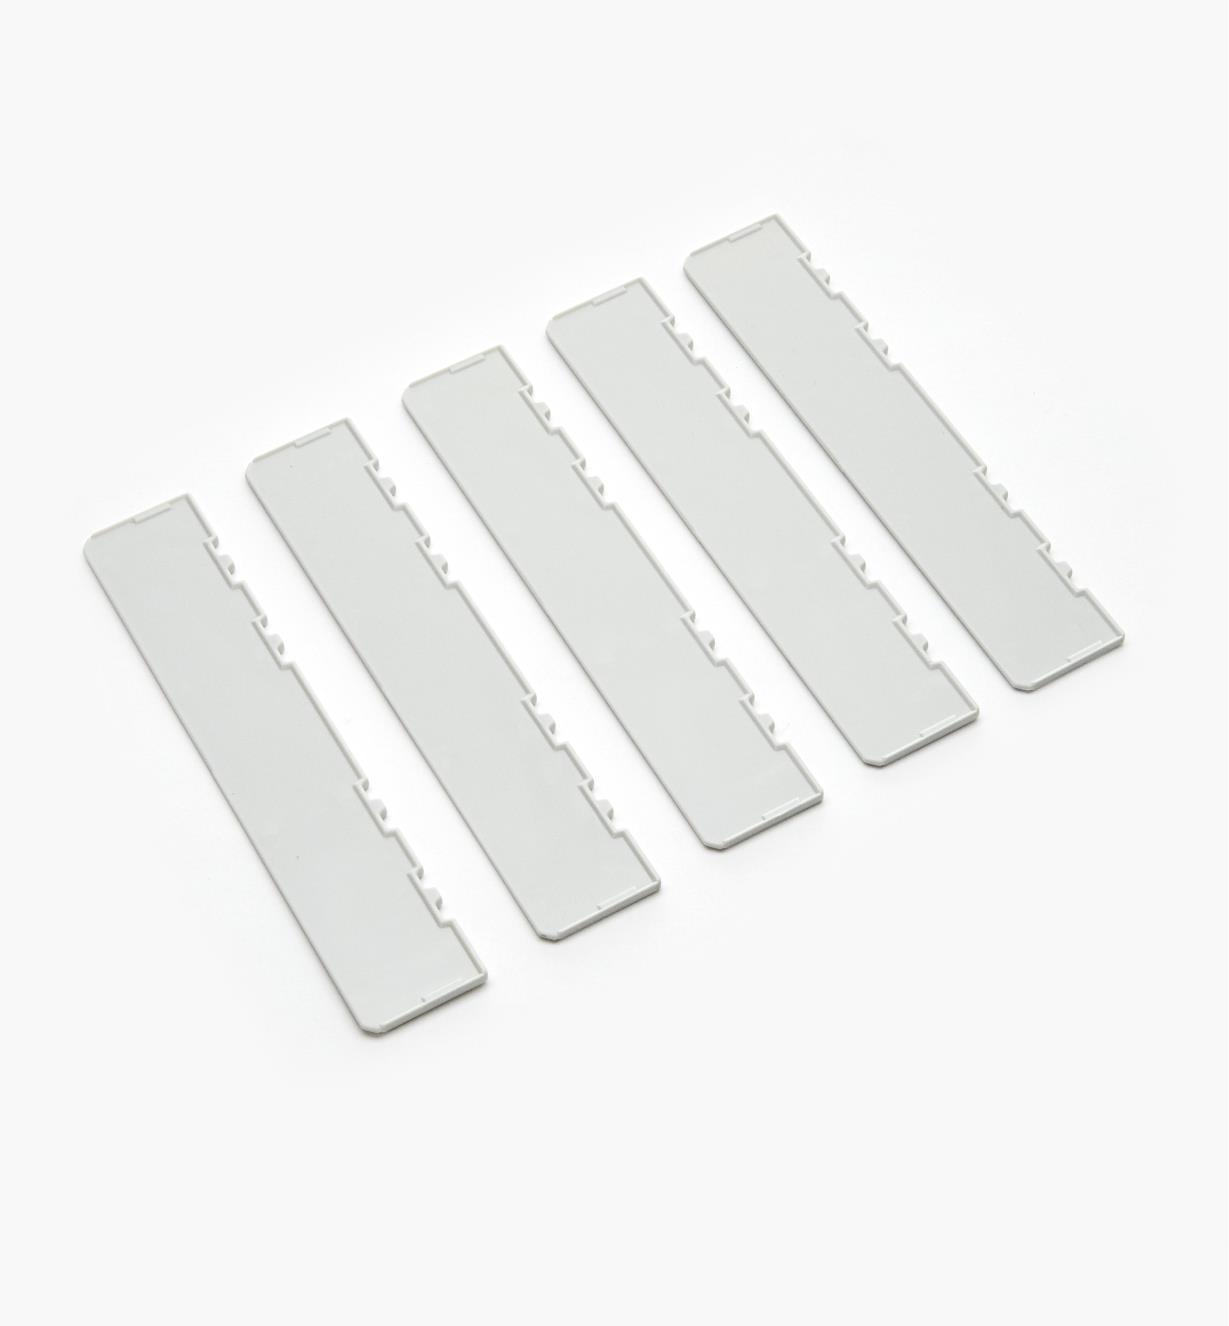 Medium Sortainer Drawer Dividers, pkg. of 10